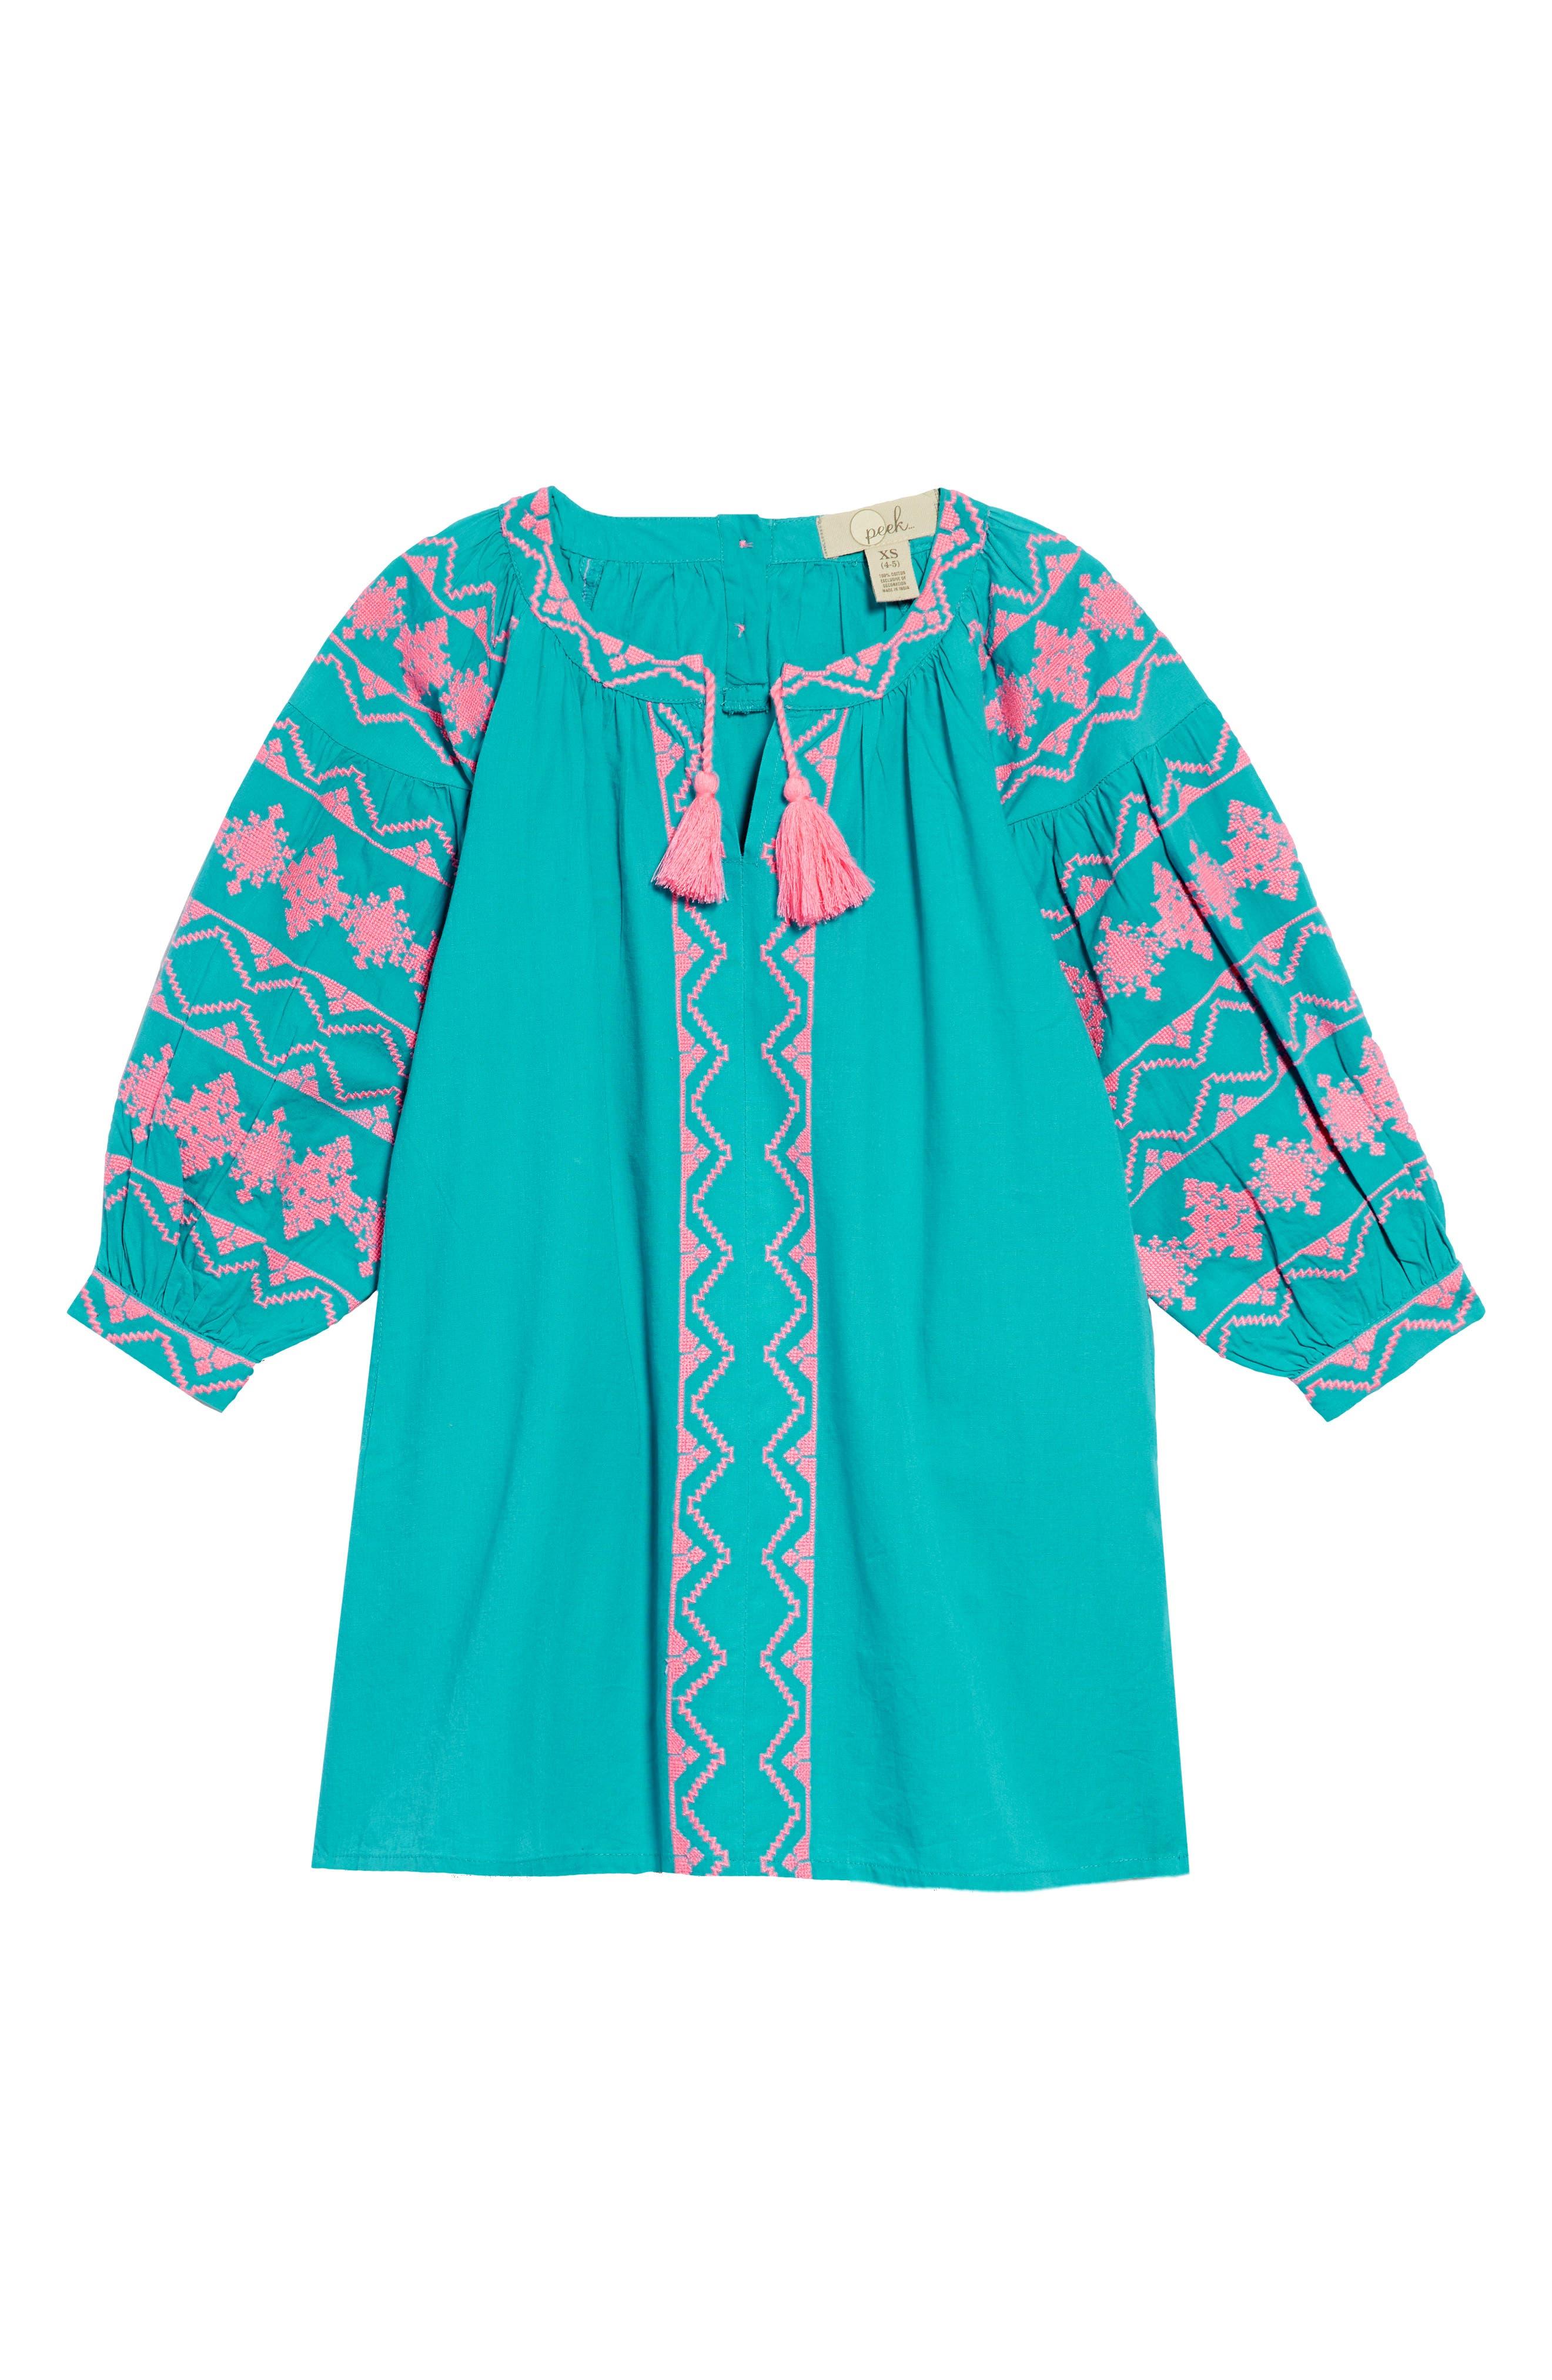 Kellie Embroidered Dress,                         Main,                         color, Teal